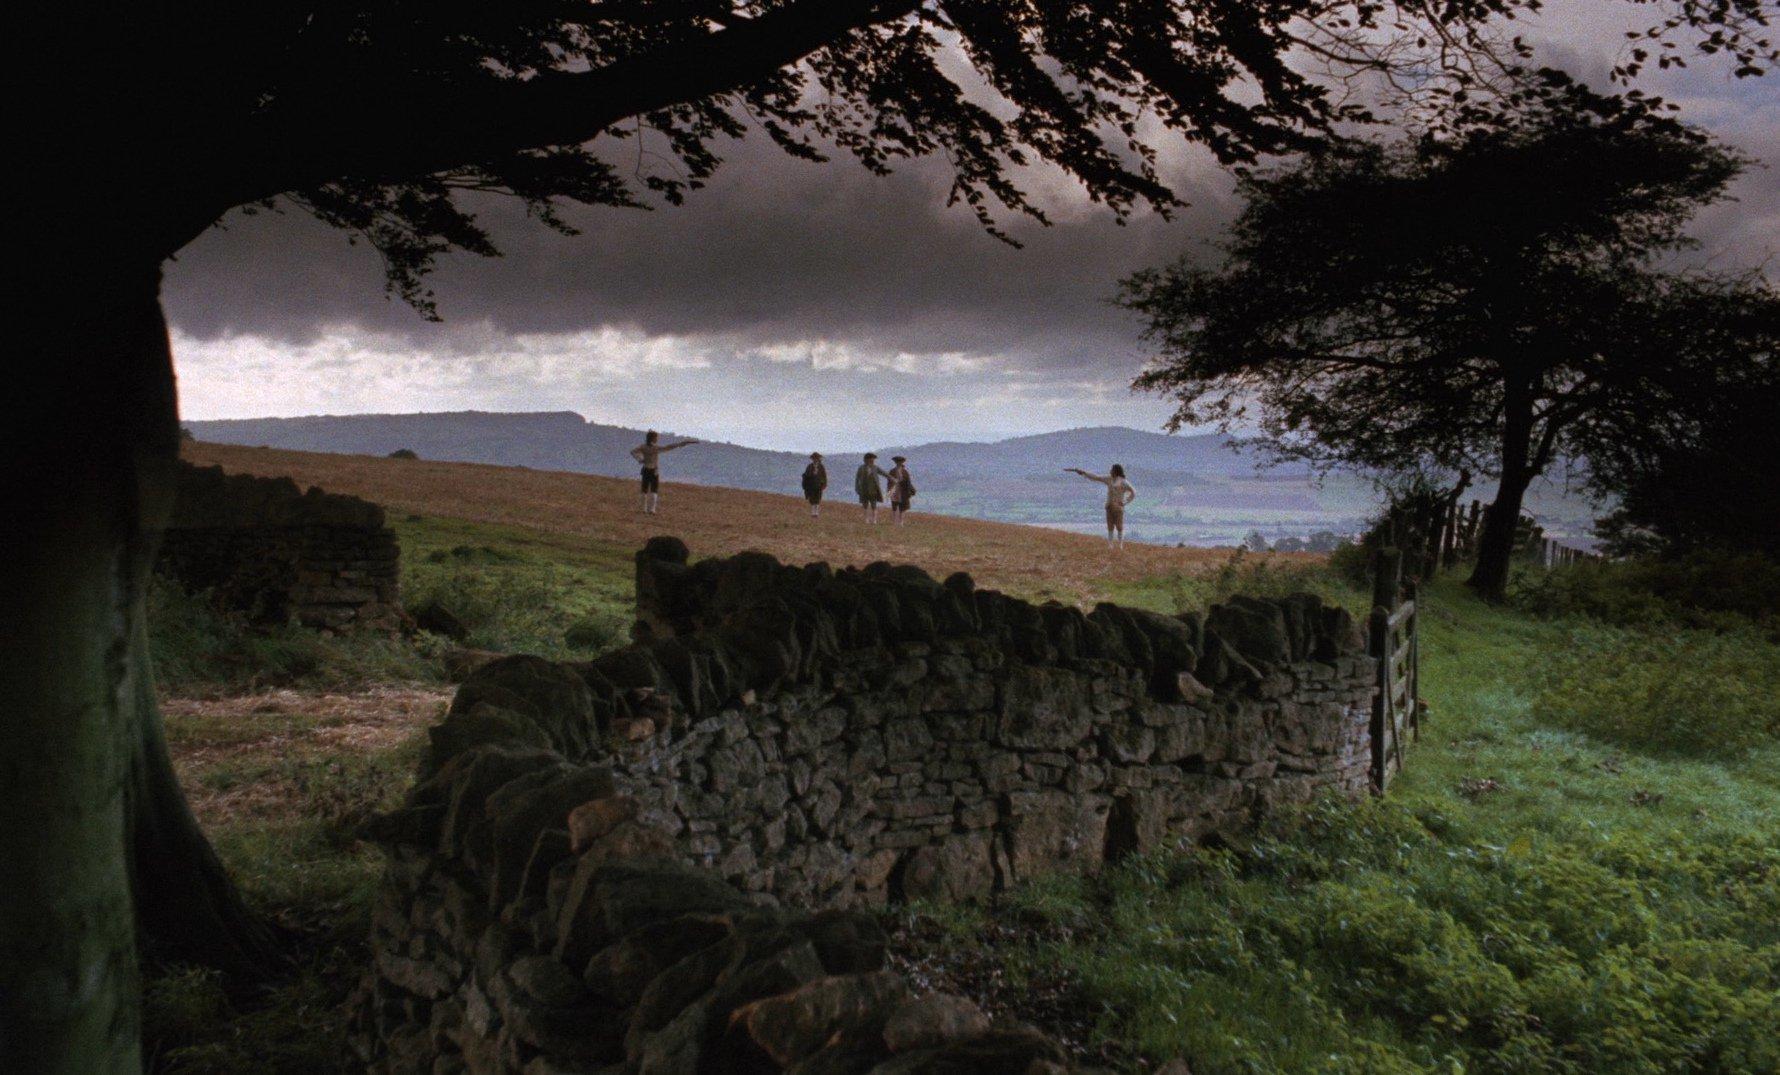 Image via the  American Cinematographer.